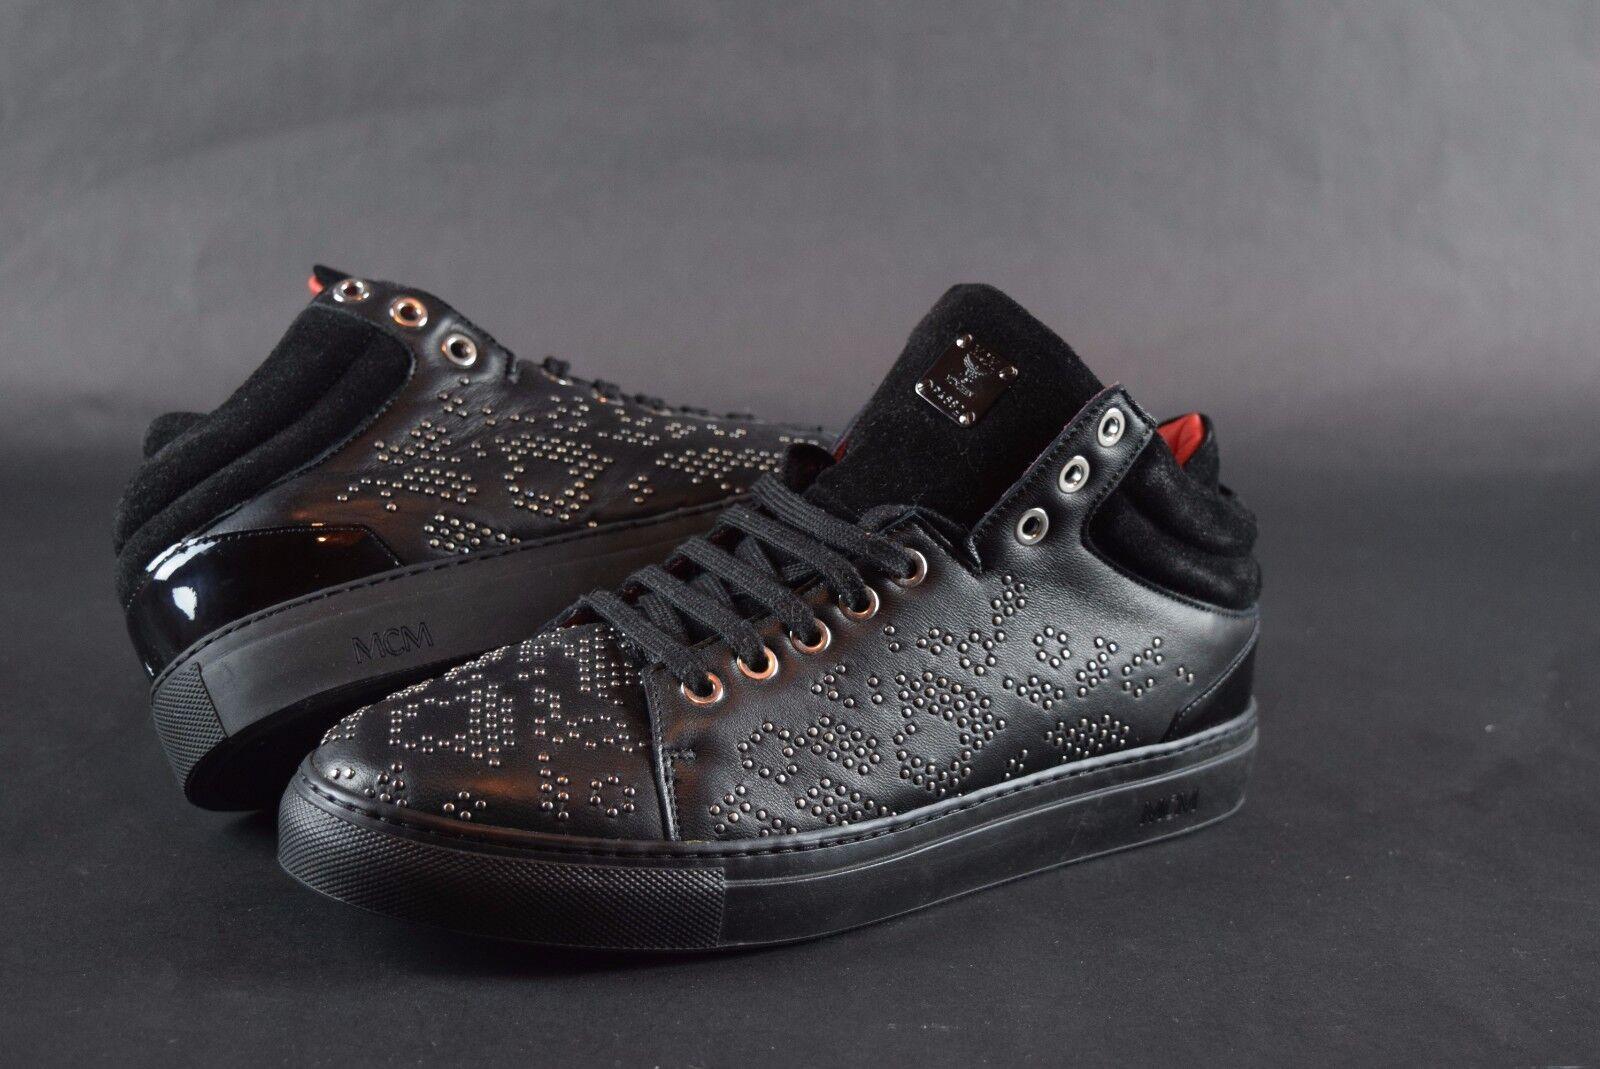 New damen MCM Studded Leather Turnschuhe sz 39 9 US schwarz schuhe retail  550 rot